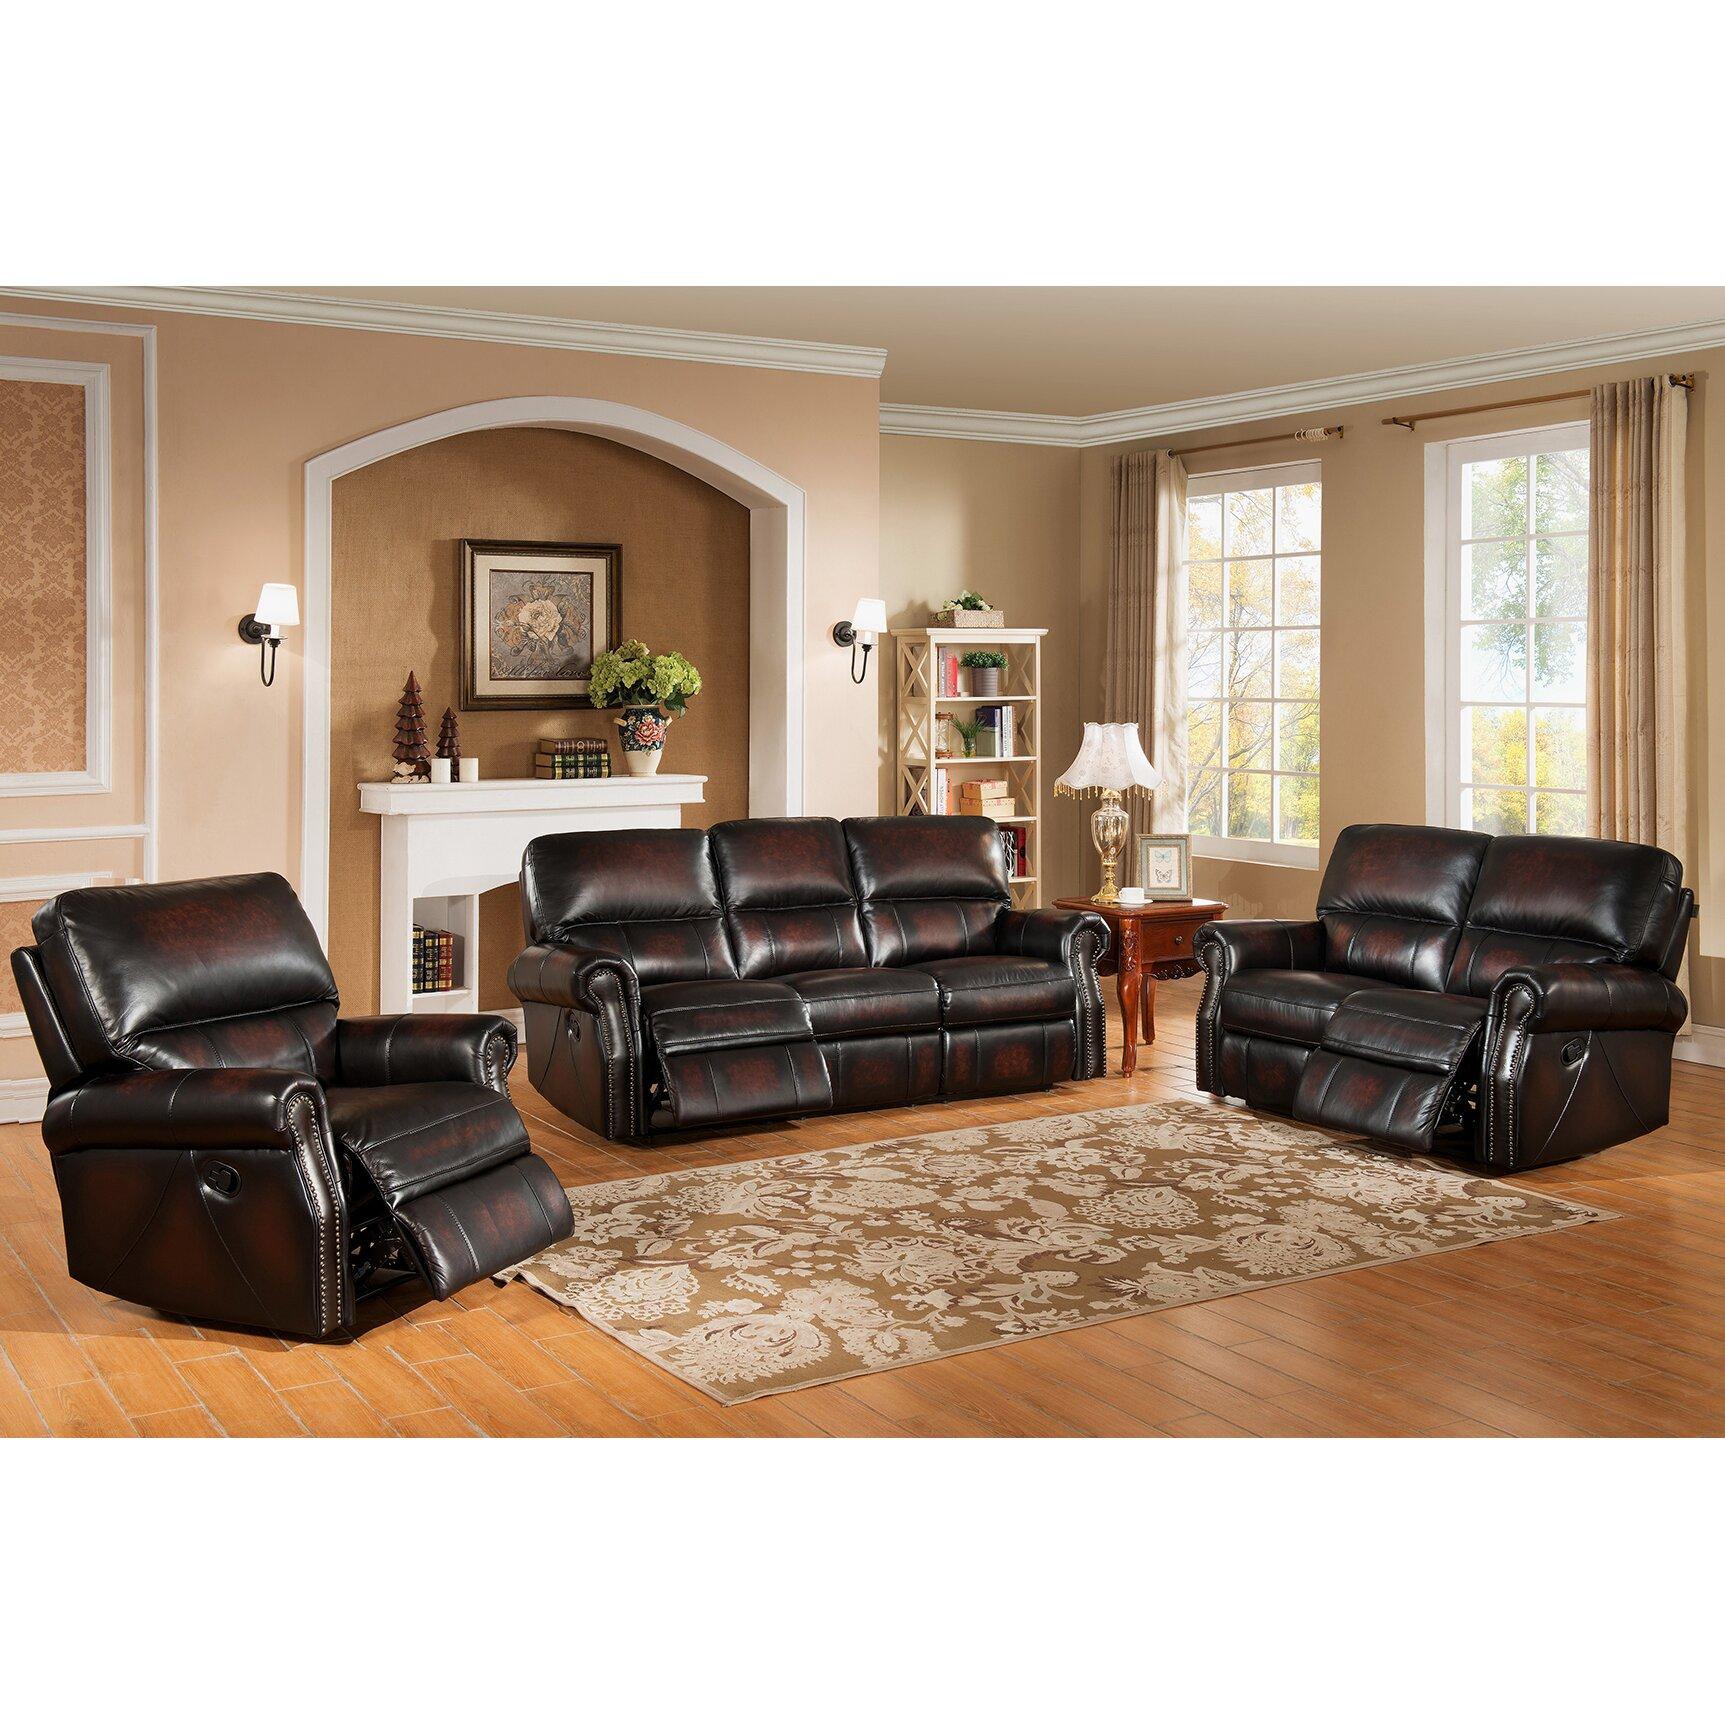 Amax nevada 3 piece leather living room set wayfair for Wg r living room sets